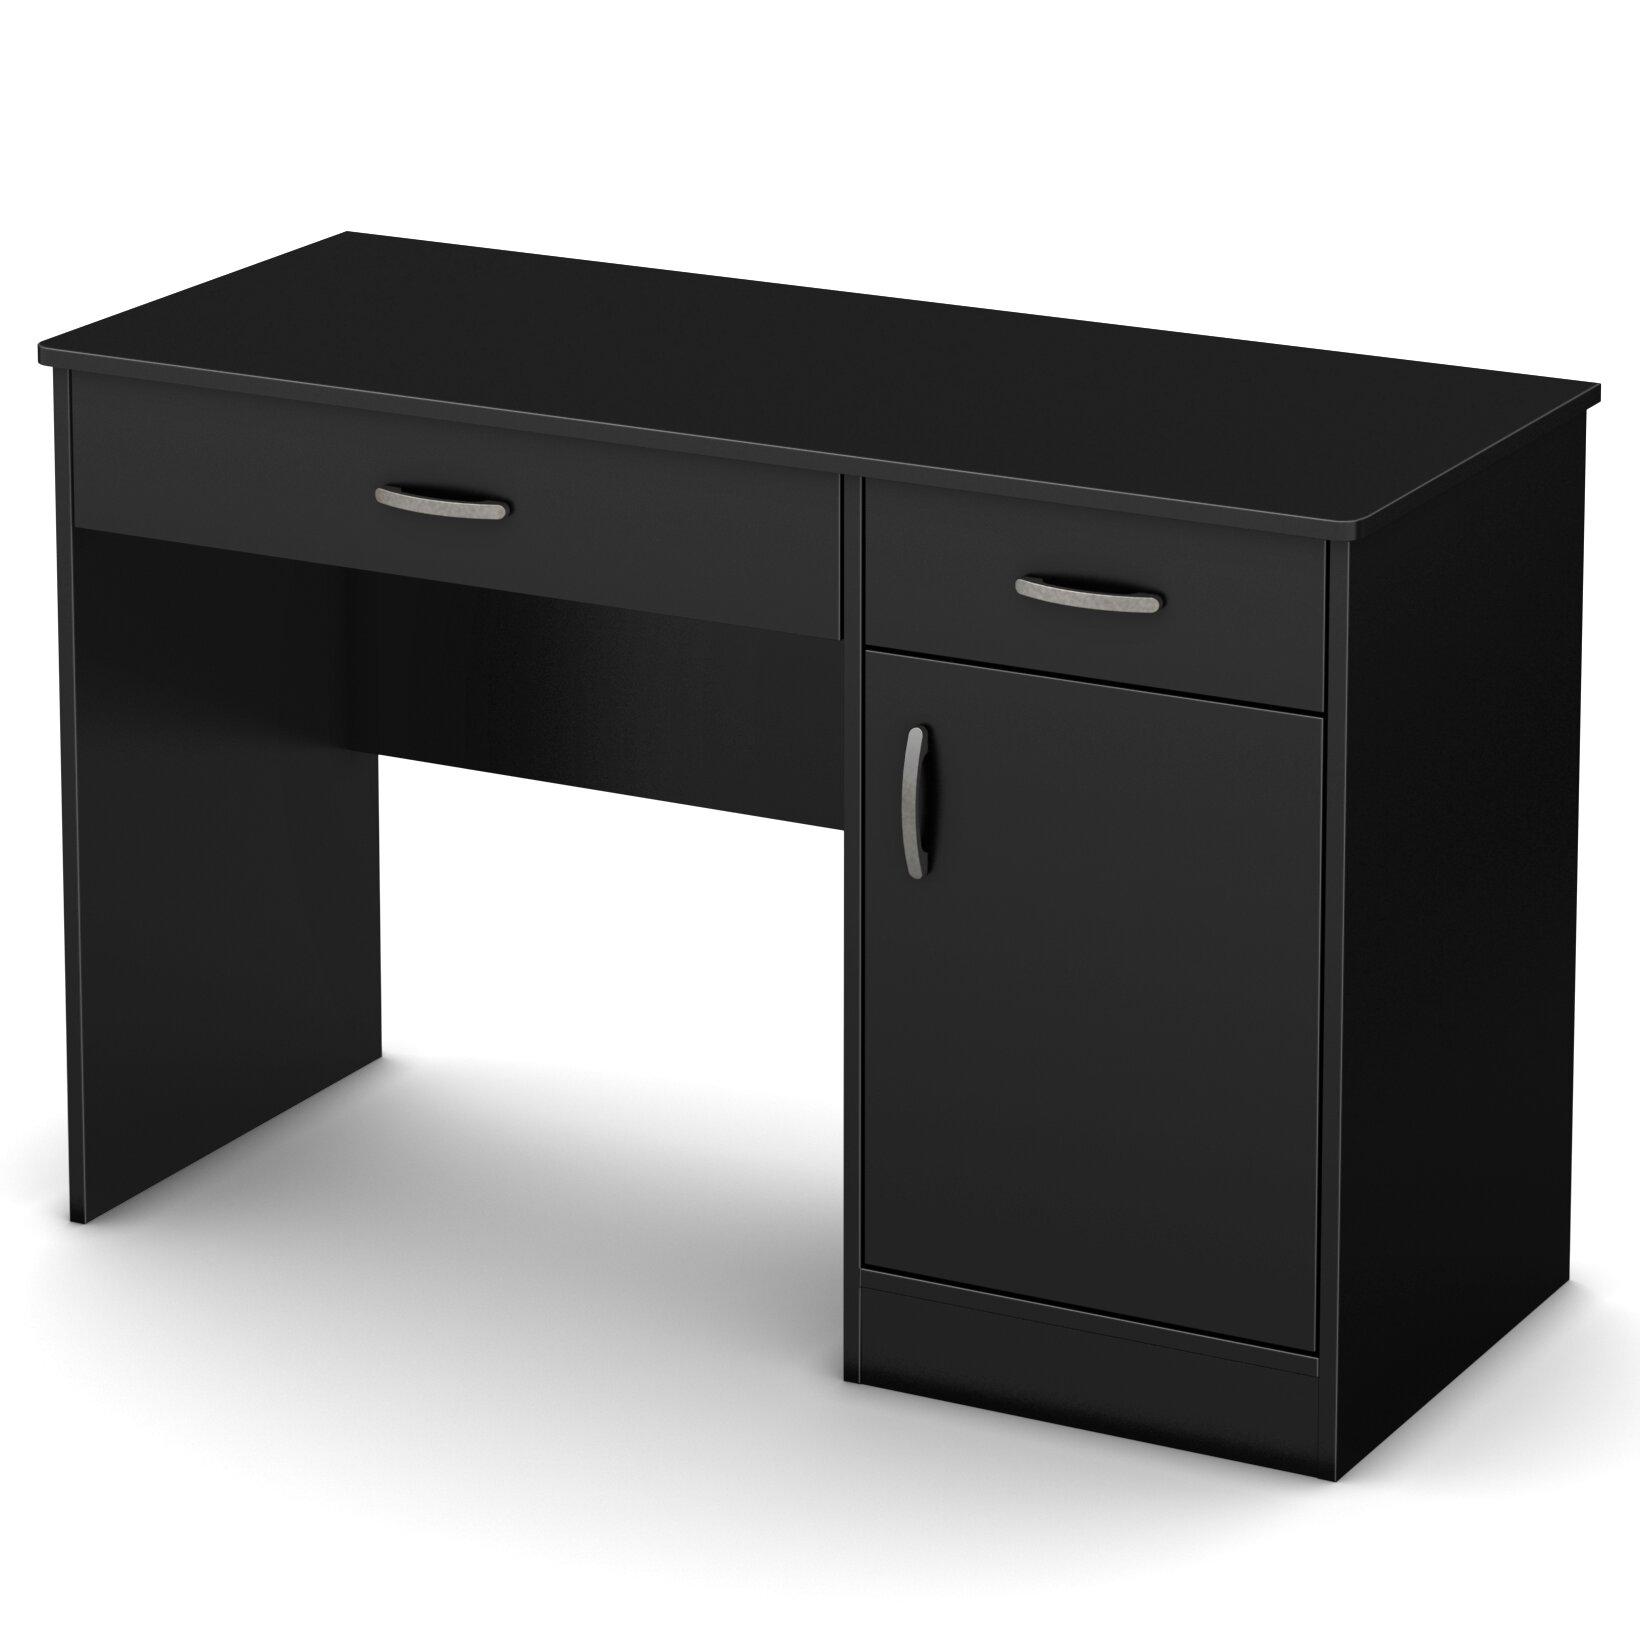 South shore axess computer desk reviews wayfair Small steel desk